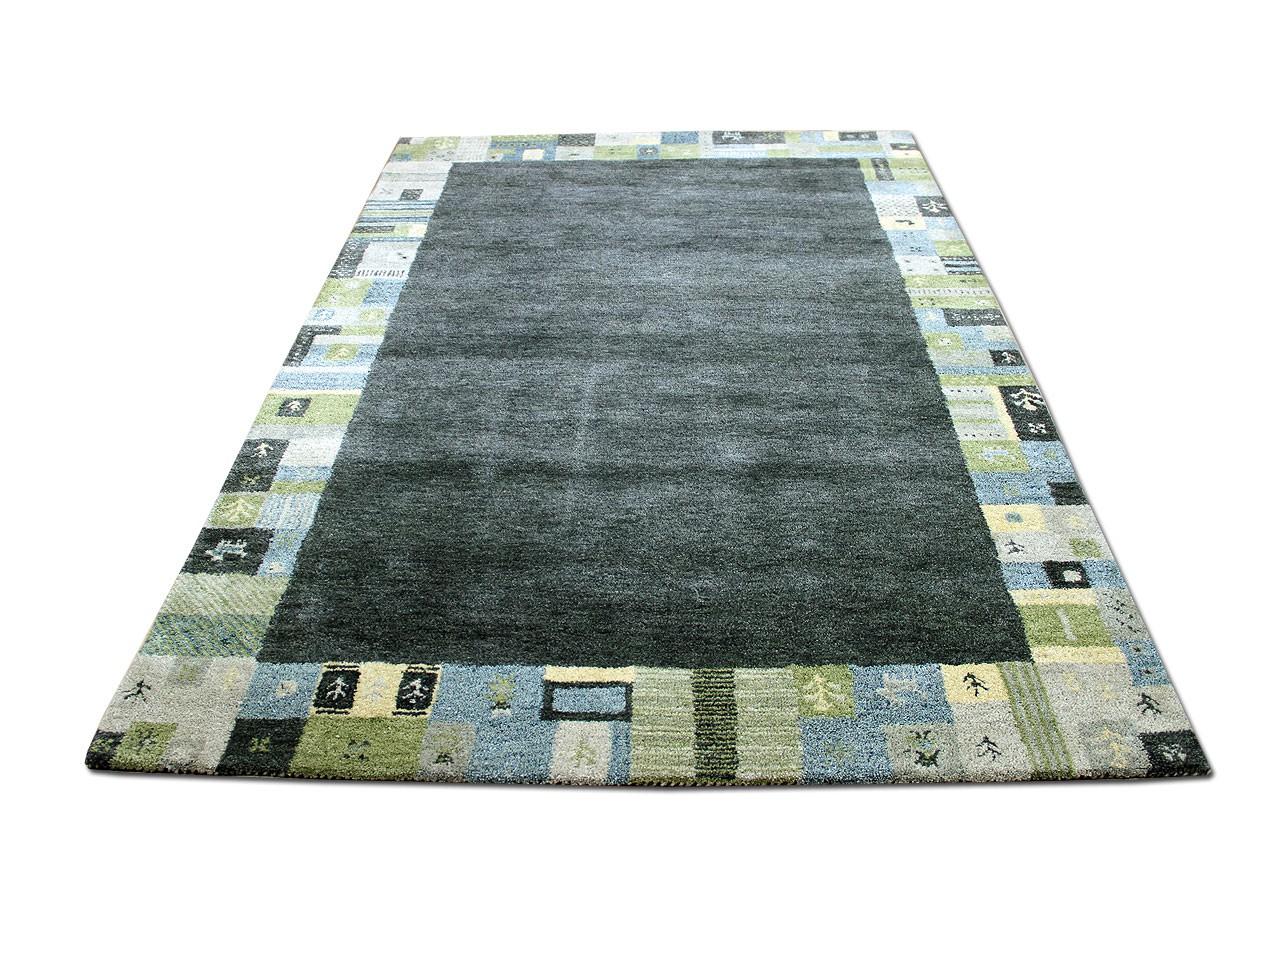 natur teppich indo gabbeh esta grau gr n bord re teppiche. Black Bedroom Furniture Sets. Home Design Ideas